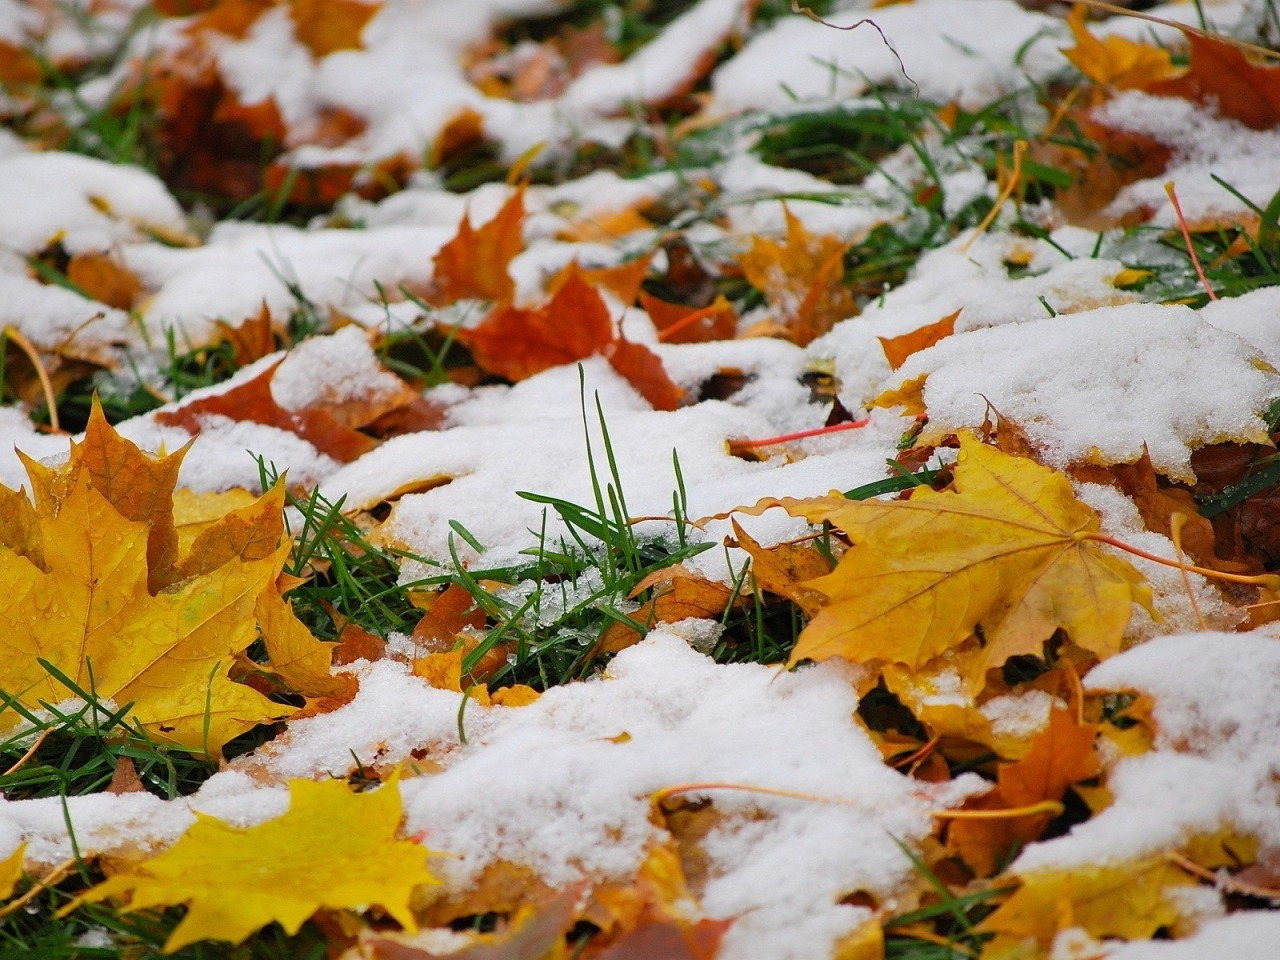 HD картинка Первый осенний снег осень, листья, снег. HD картинки на рабочий стол